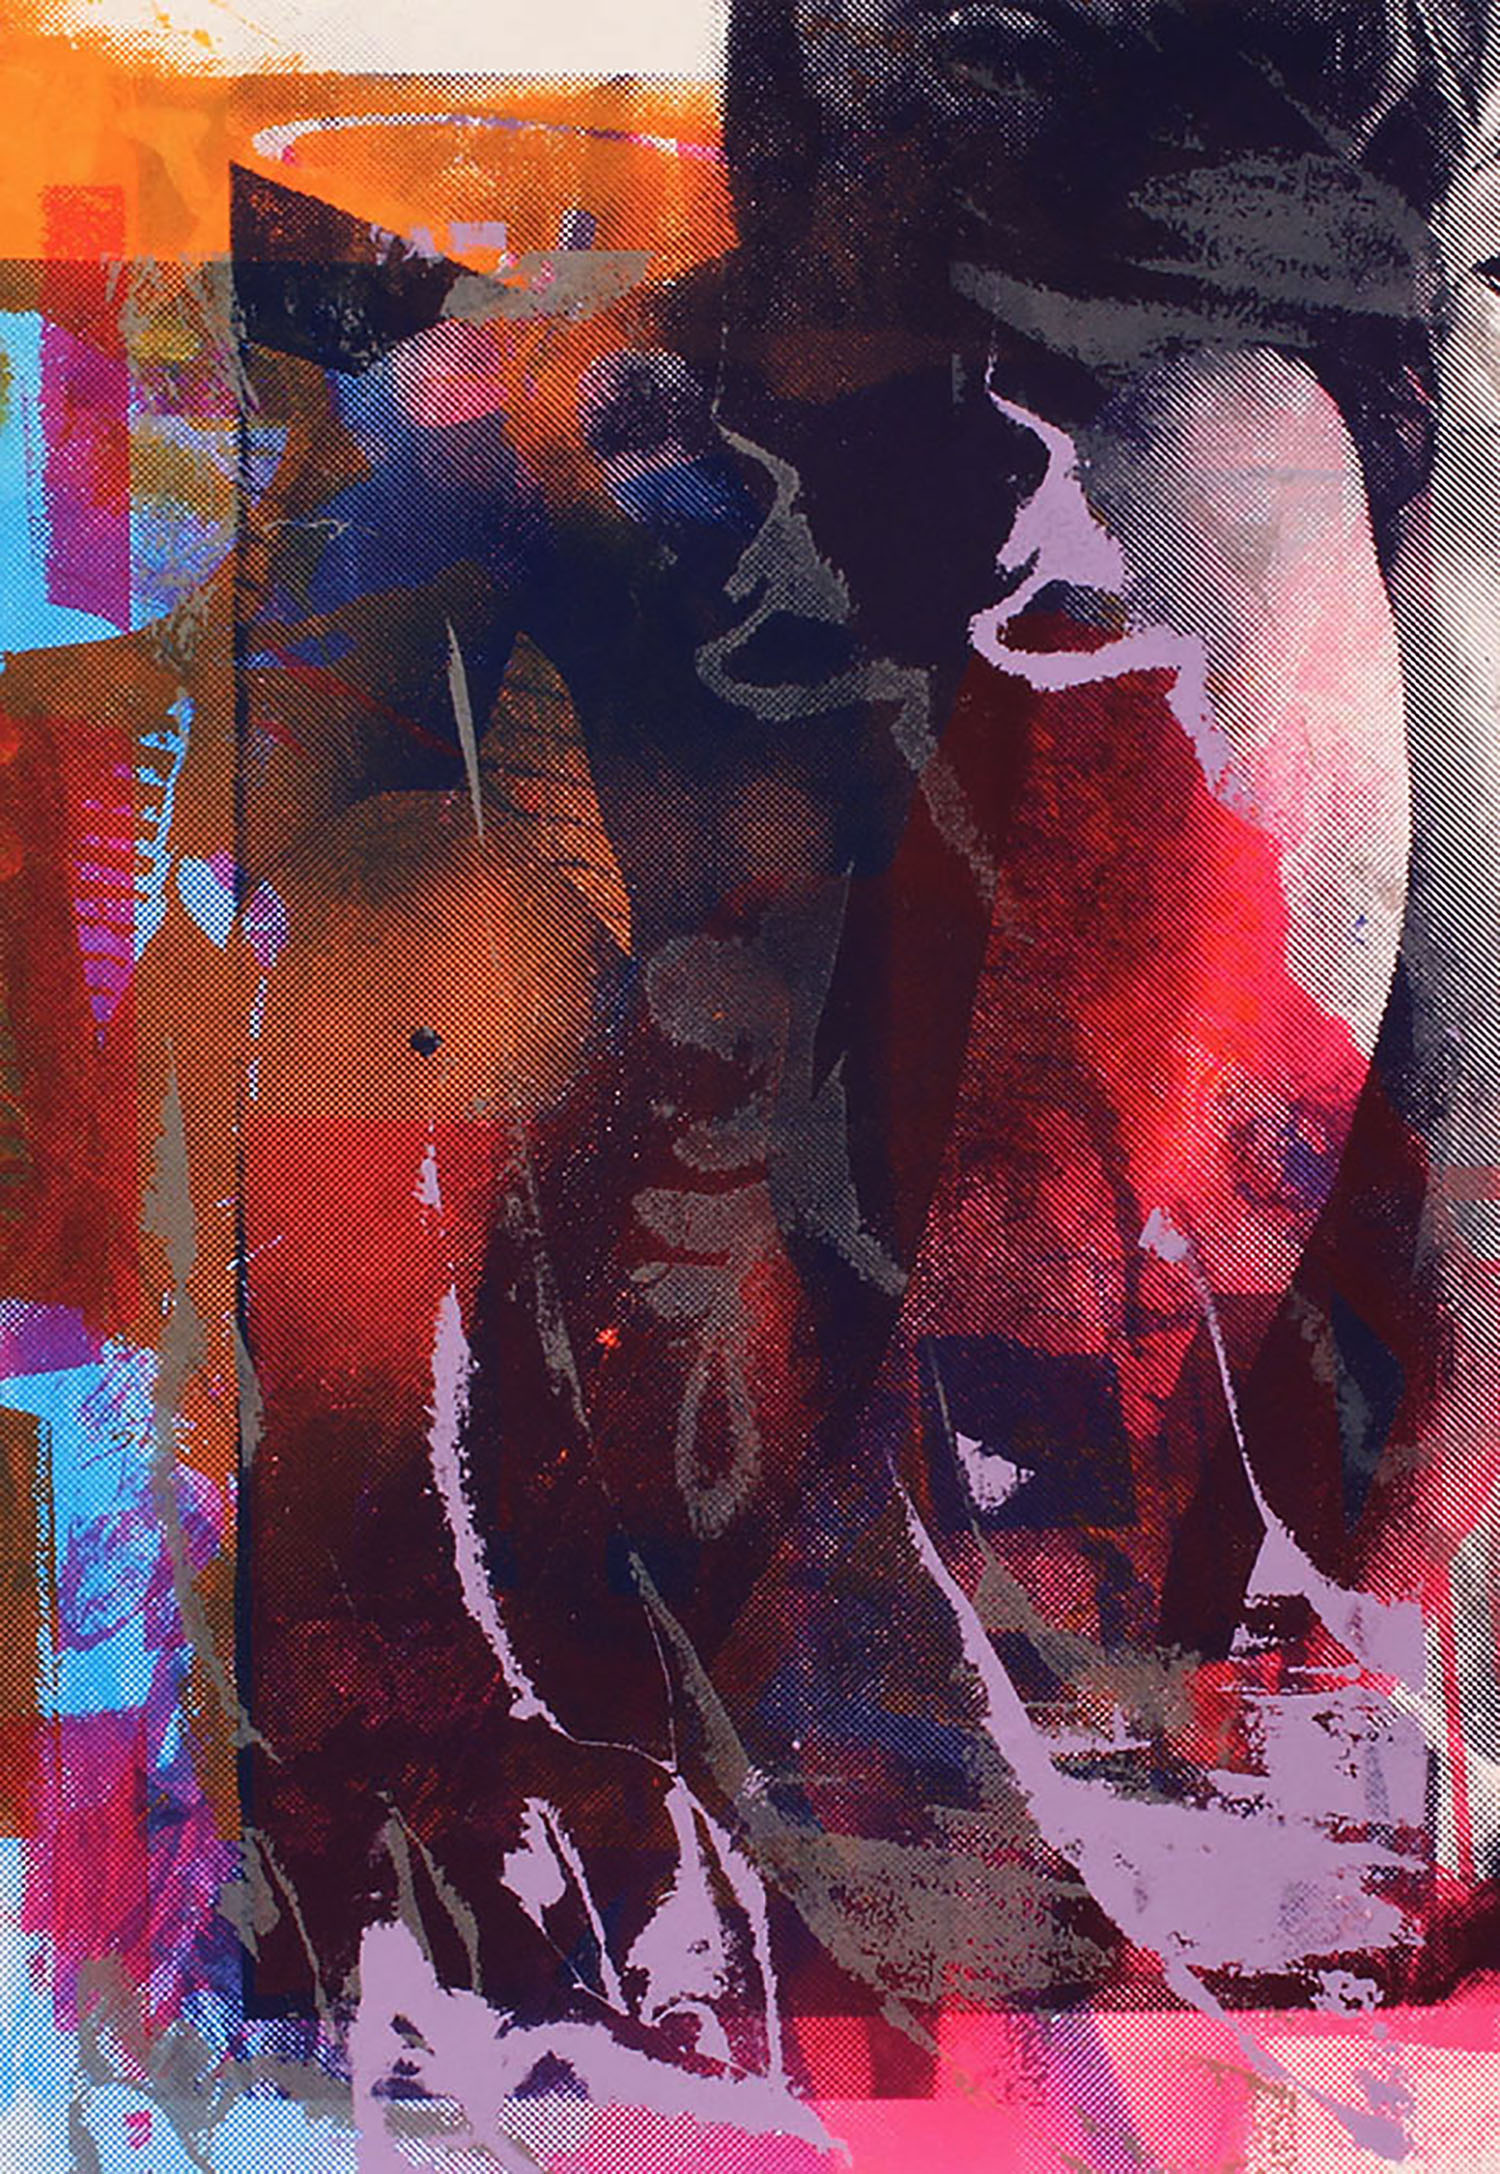 "Crouching  Figure Screenprint, 16x14"", 2015"